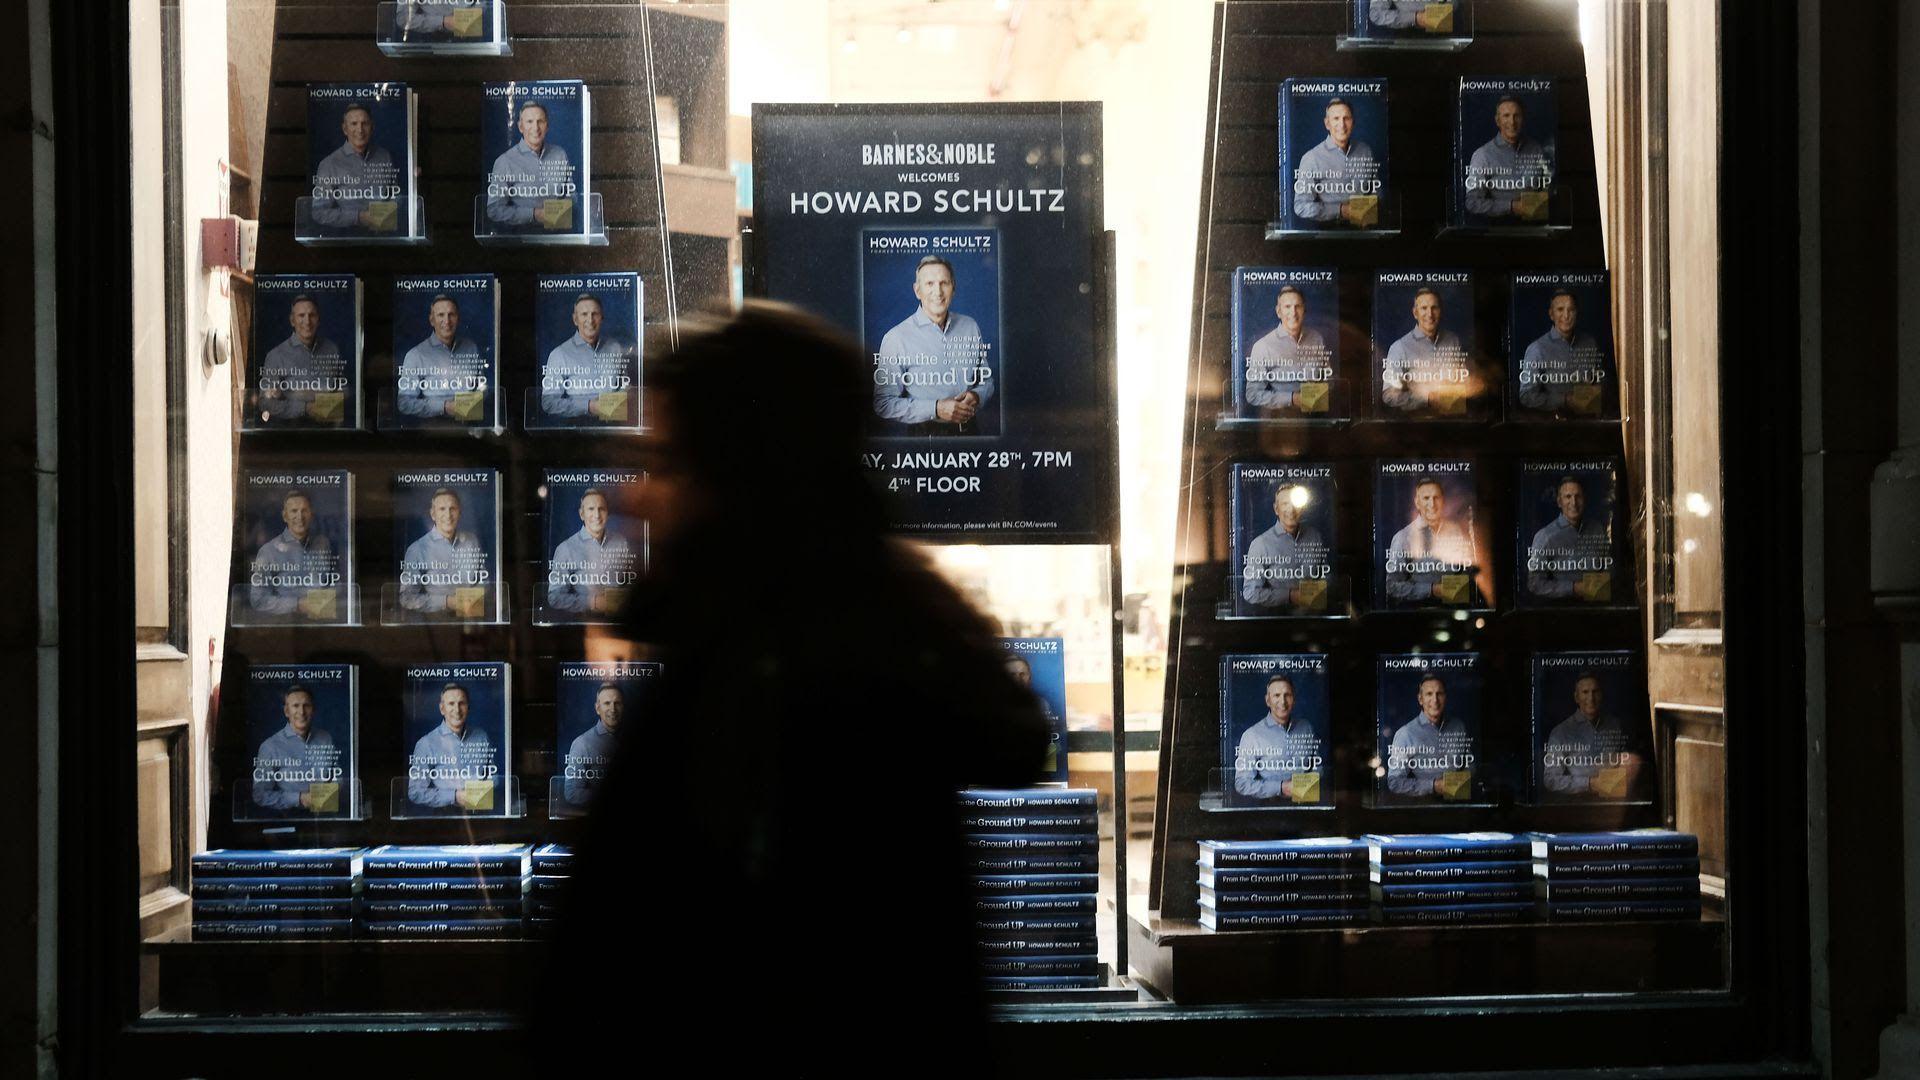 Short sellers take aim at Starbucks as Howard Schultz weighs 2020